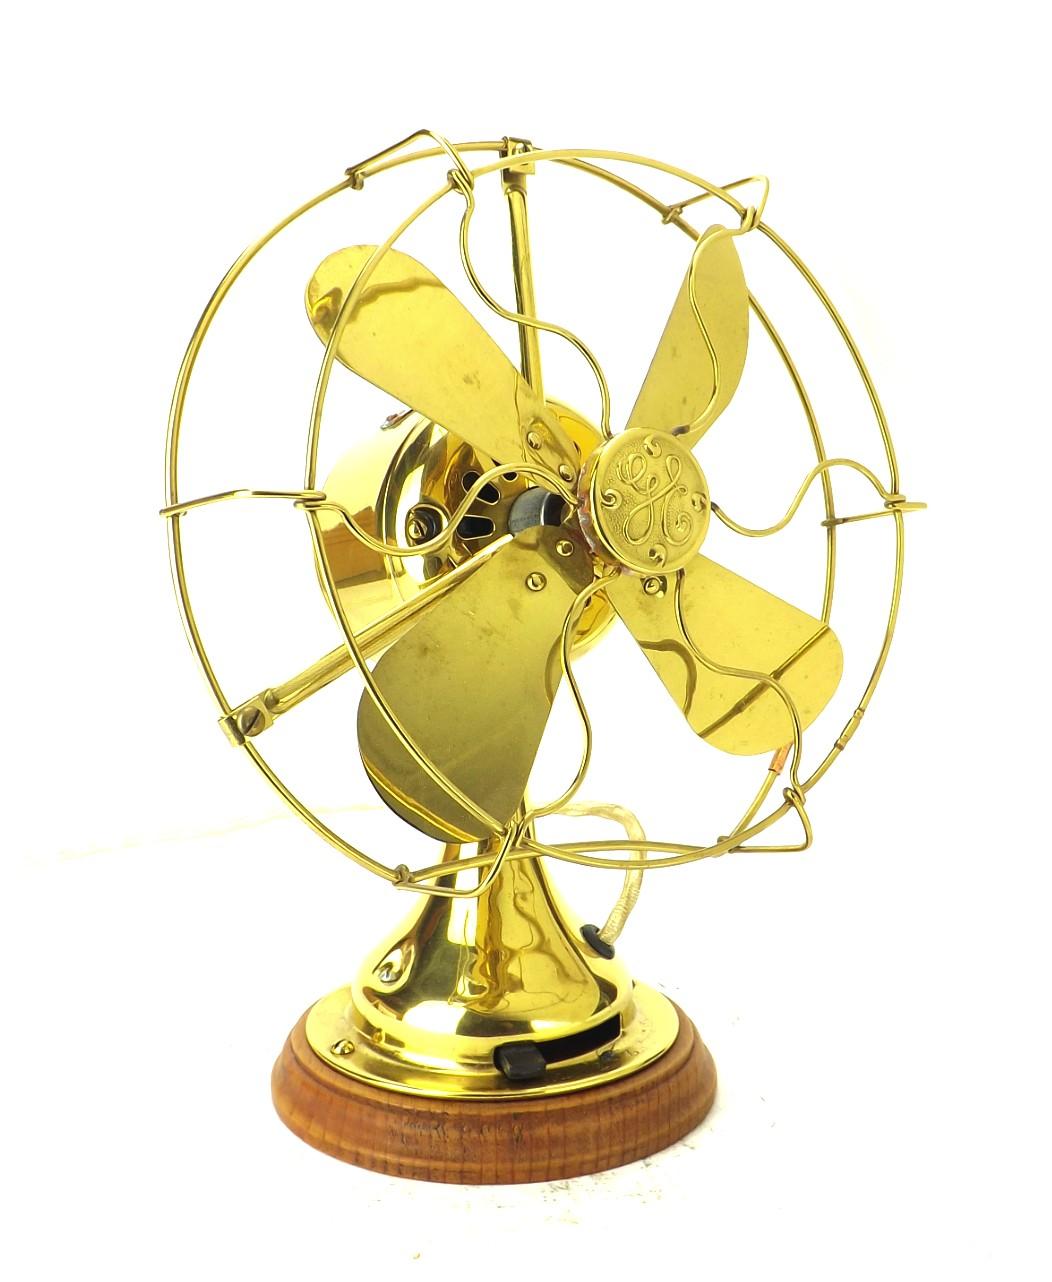 "Circa 1919 8"" GE All Brass Desk Fan Polished"